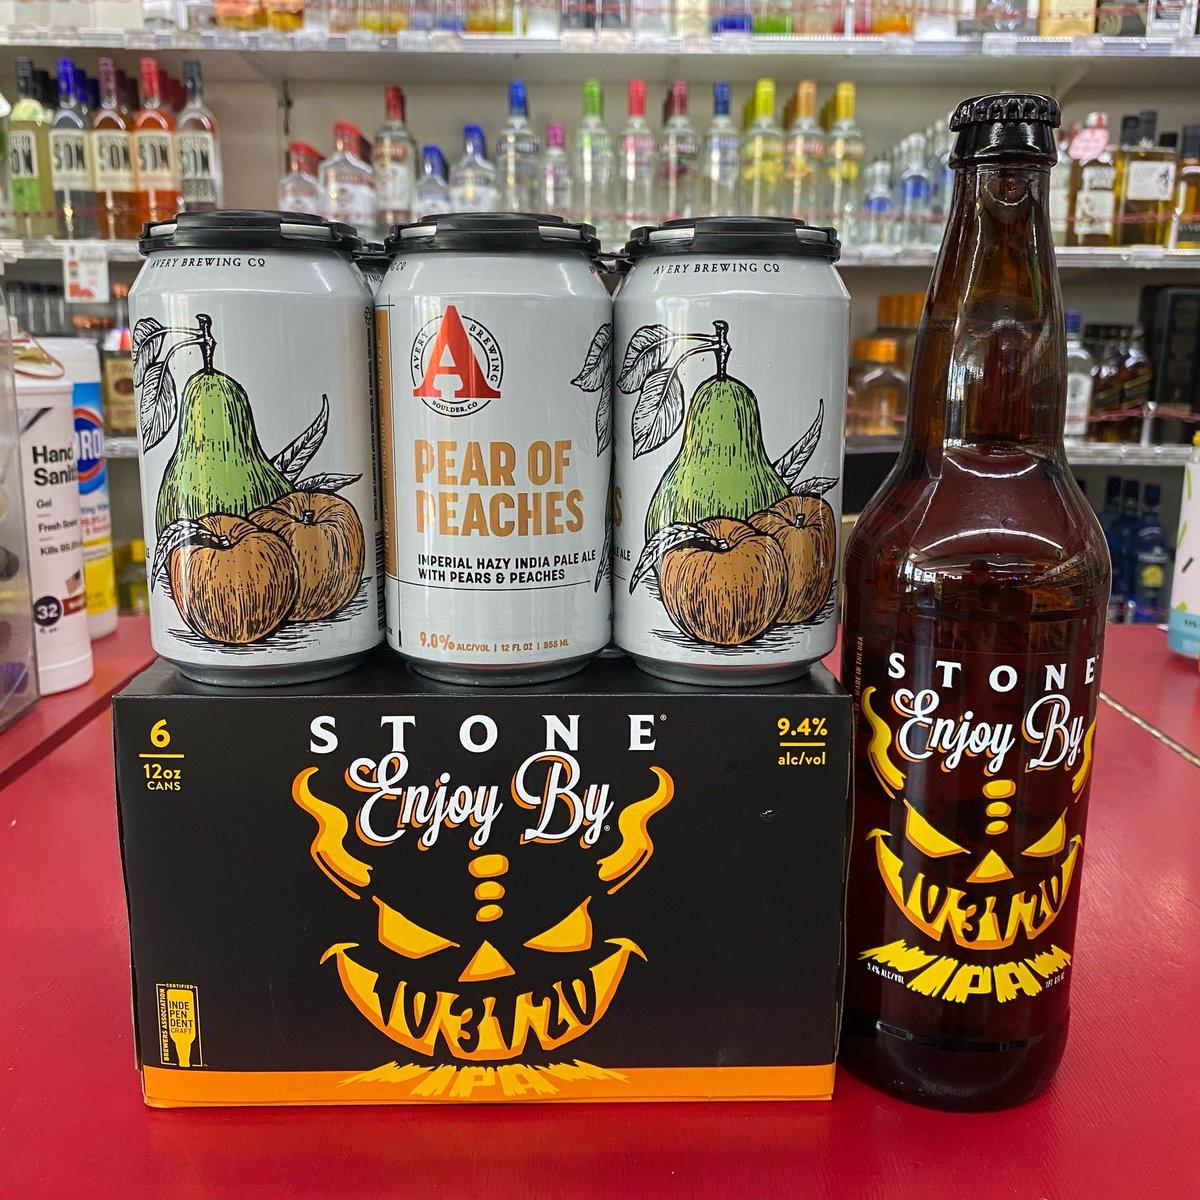 Now in stock! @averybrewingco #pearofpeaches #imperialhazyipa #hazyipa #peaches #pear @stonebrewing #enjoyby #ipa #beer #craftbeer #bottleshop #3ten #3tenliquor #shoplocal #cheers https://t.co/lSo3cW68Np